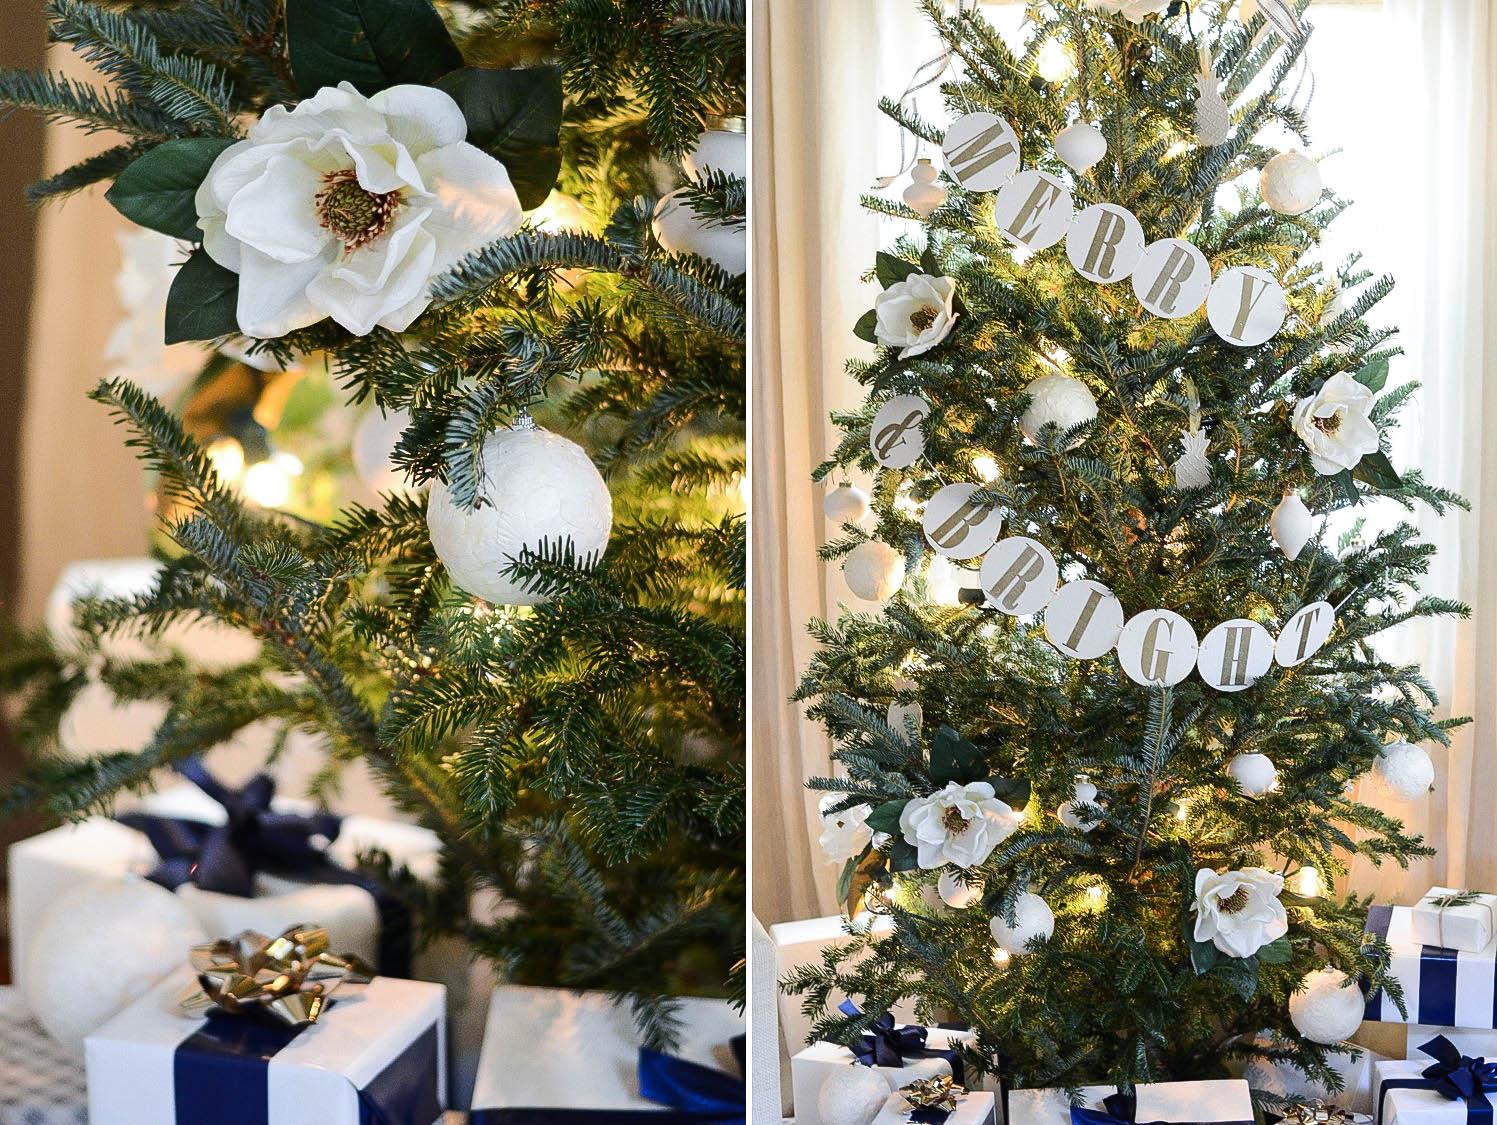 Merry & Bright Tree Garland